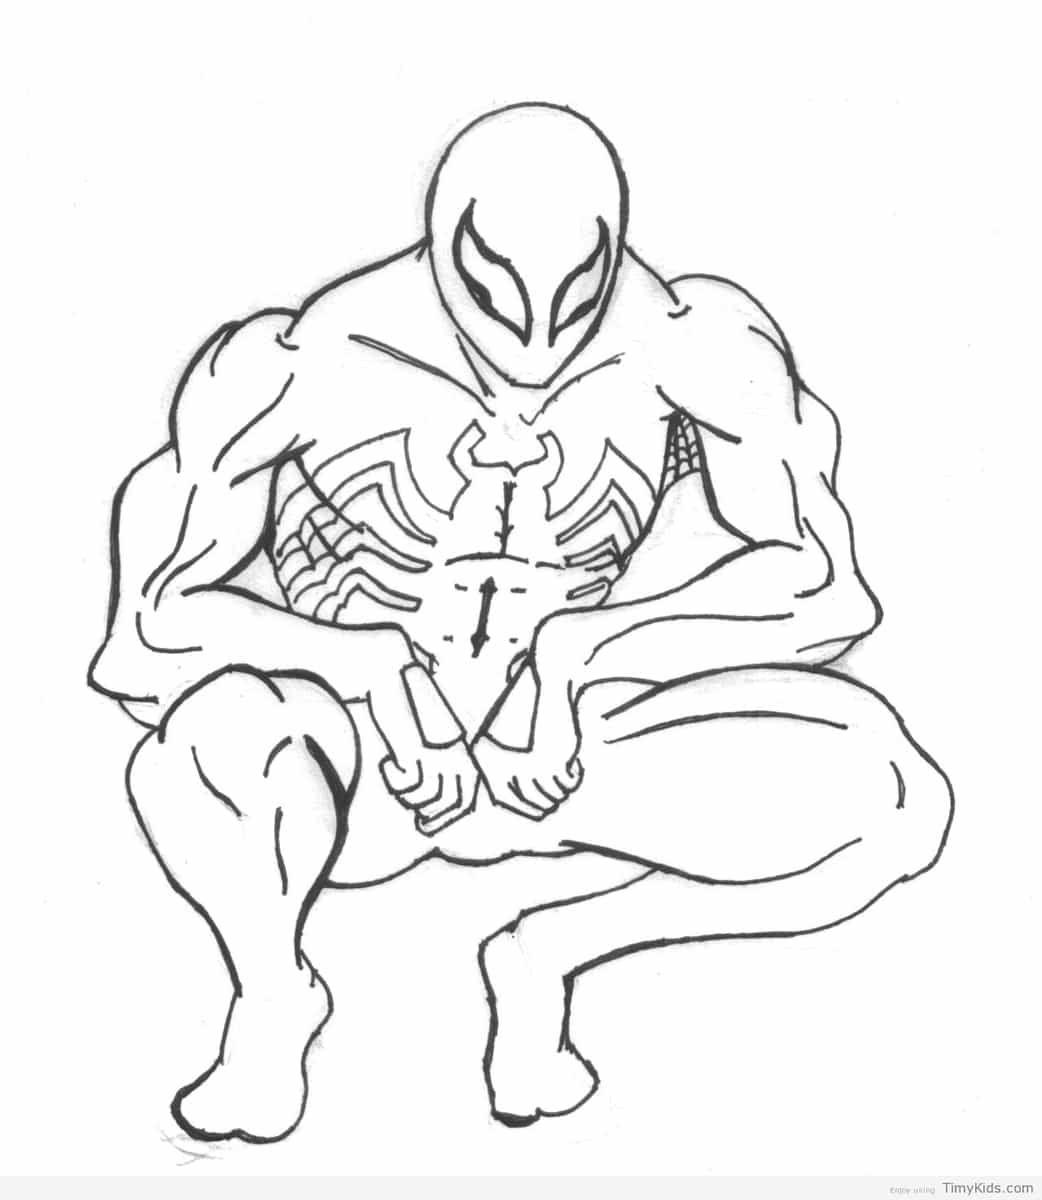 http://timykids.com/black-suit-spiderman-coloring-pages